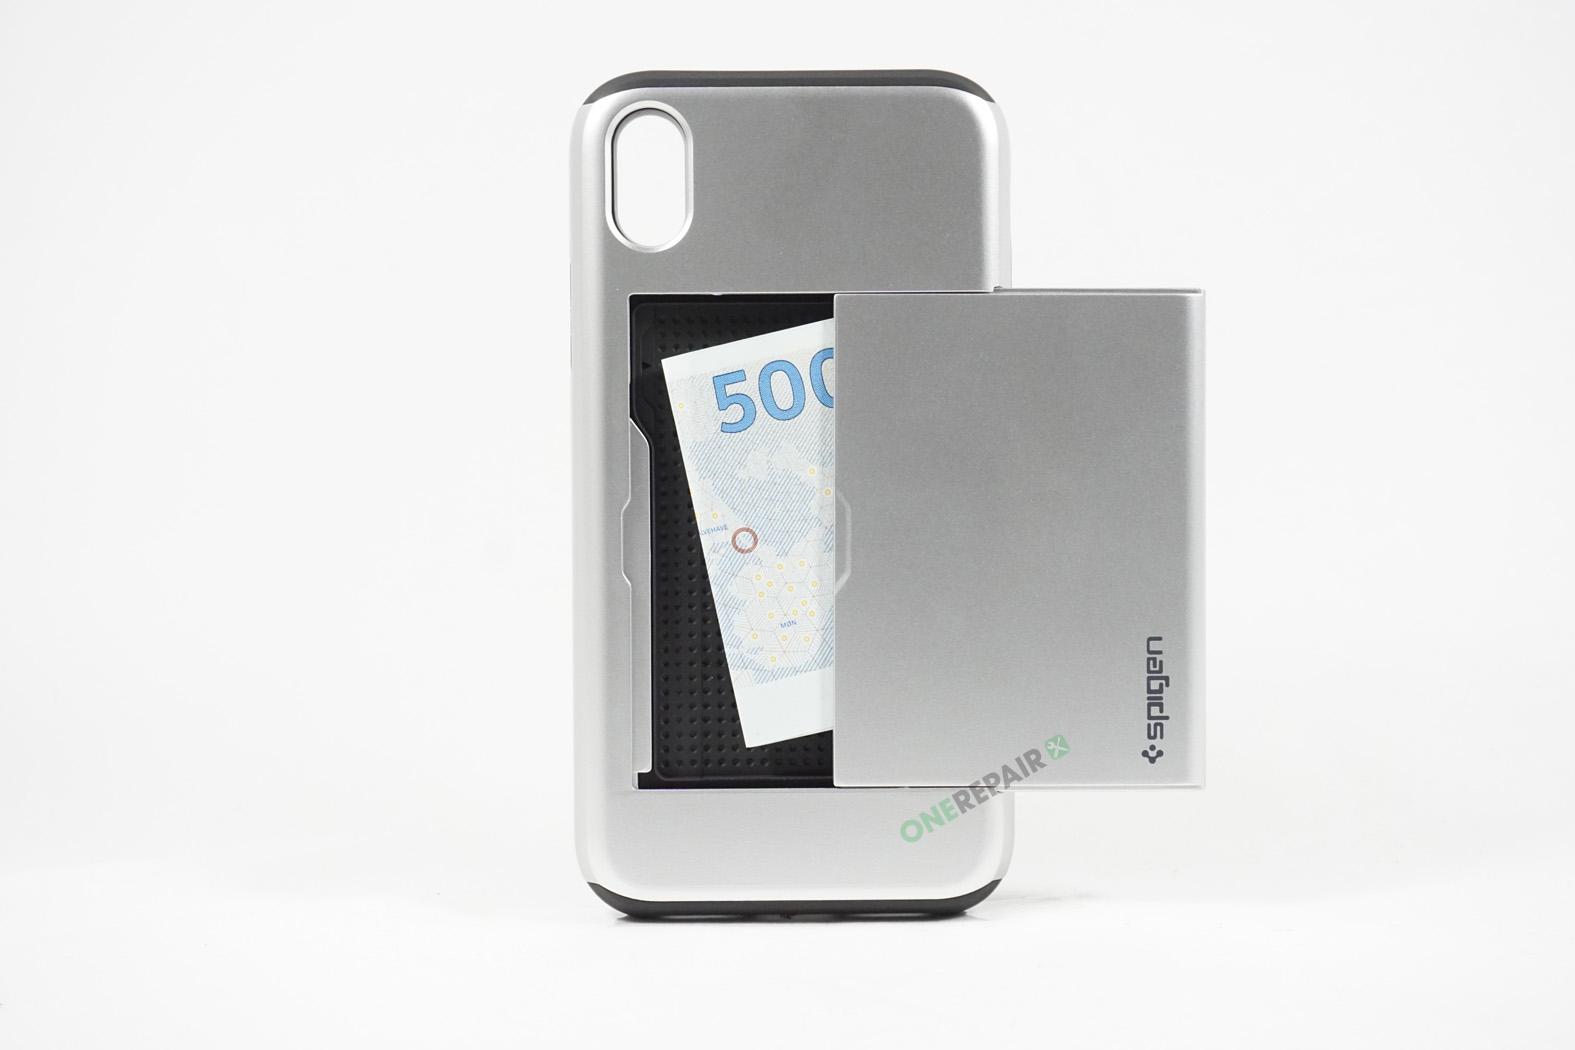 352021_iPhone_Xs_Max_Hardcase_Cover_Kortholder_Soelv_OneRepair_00004